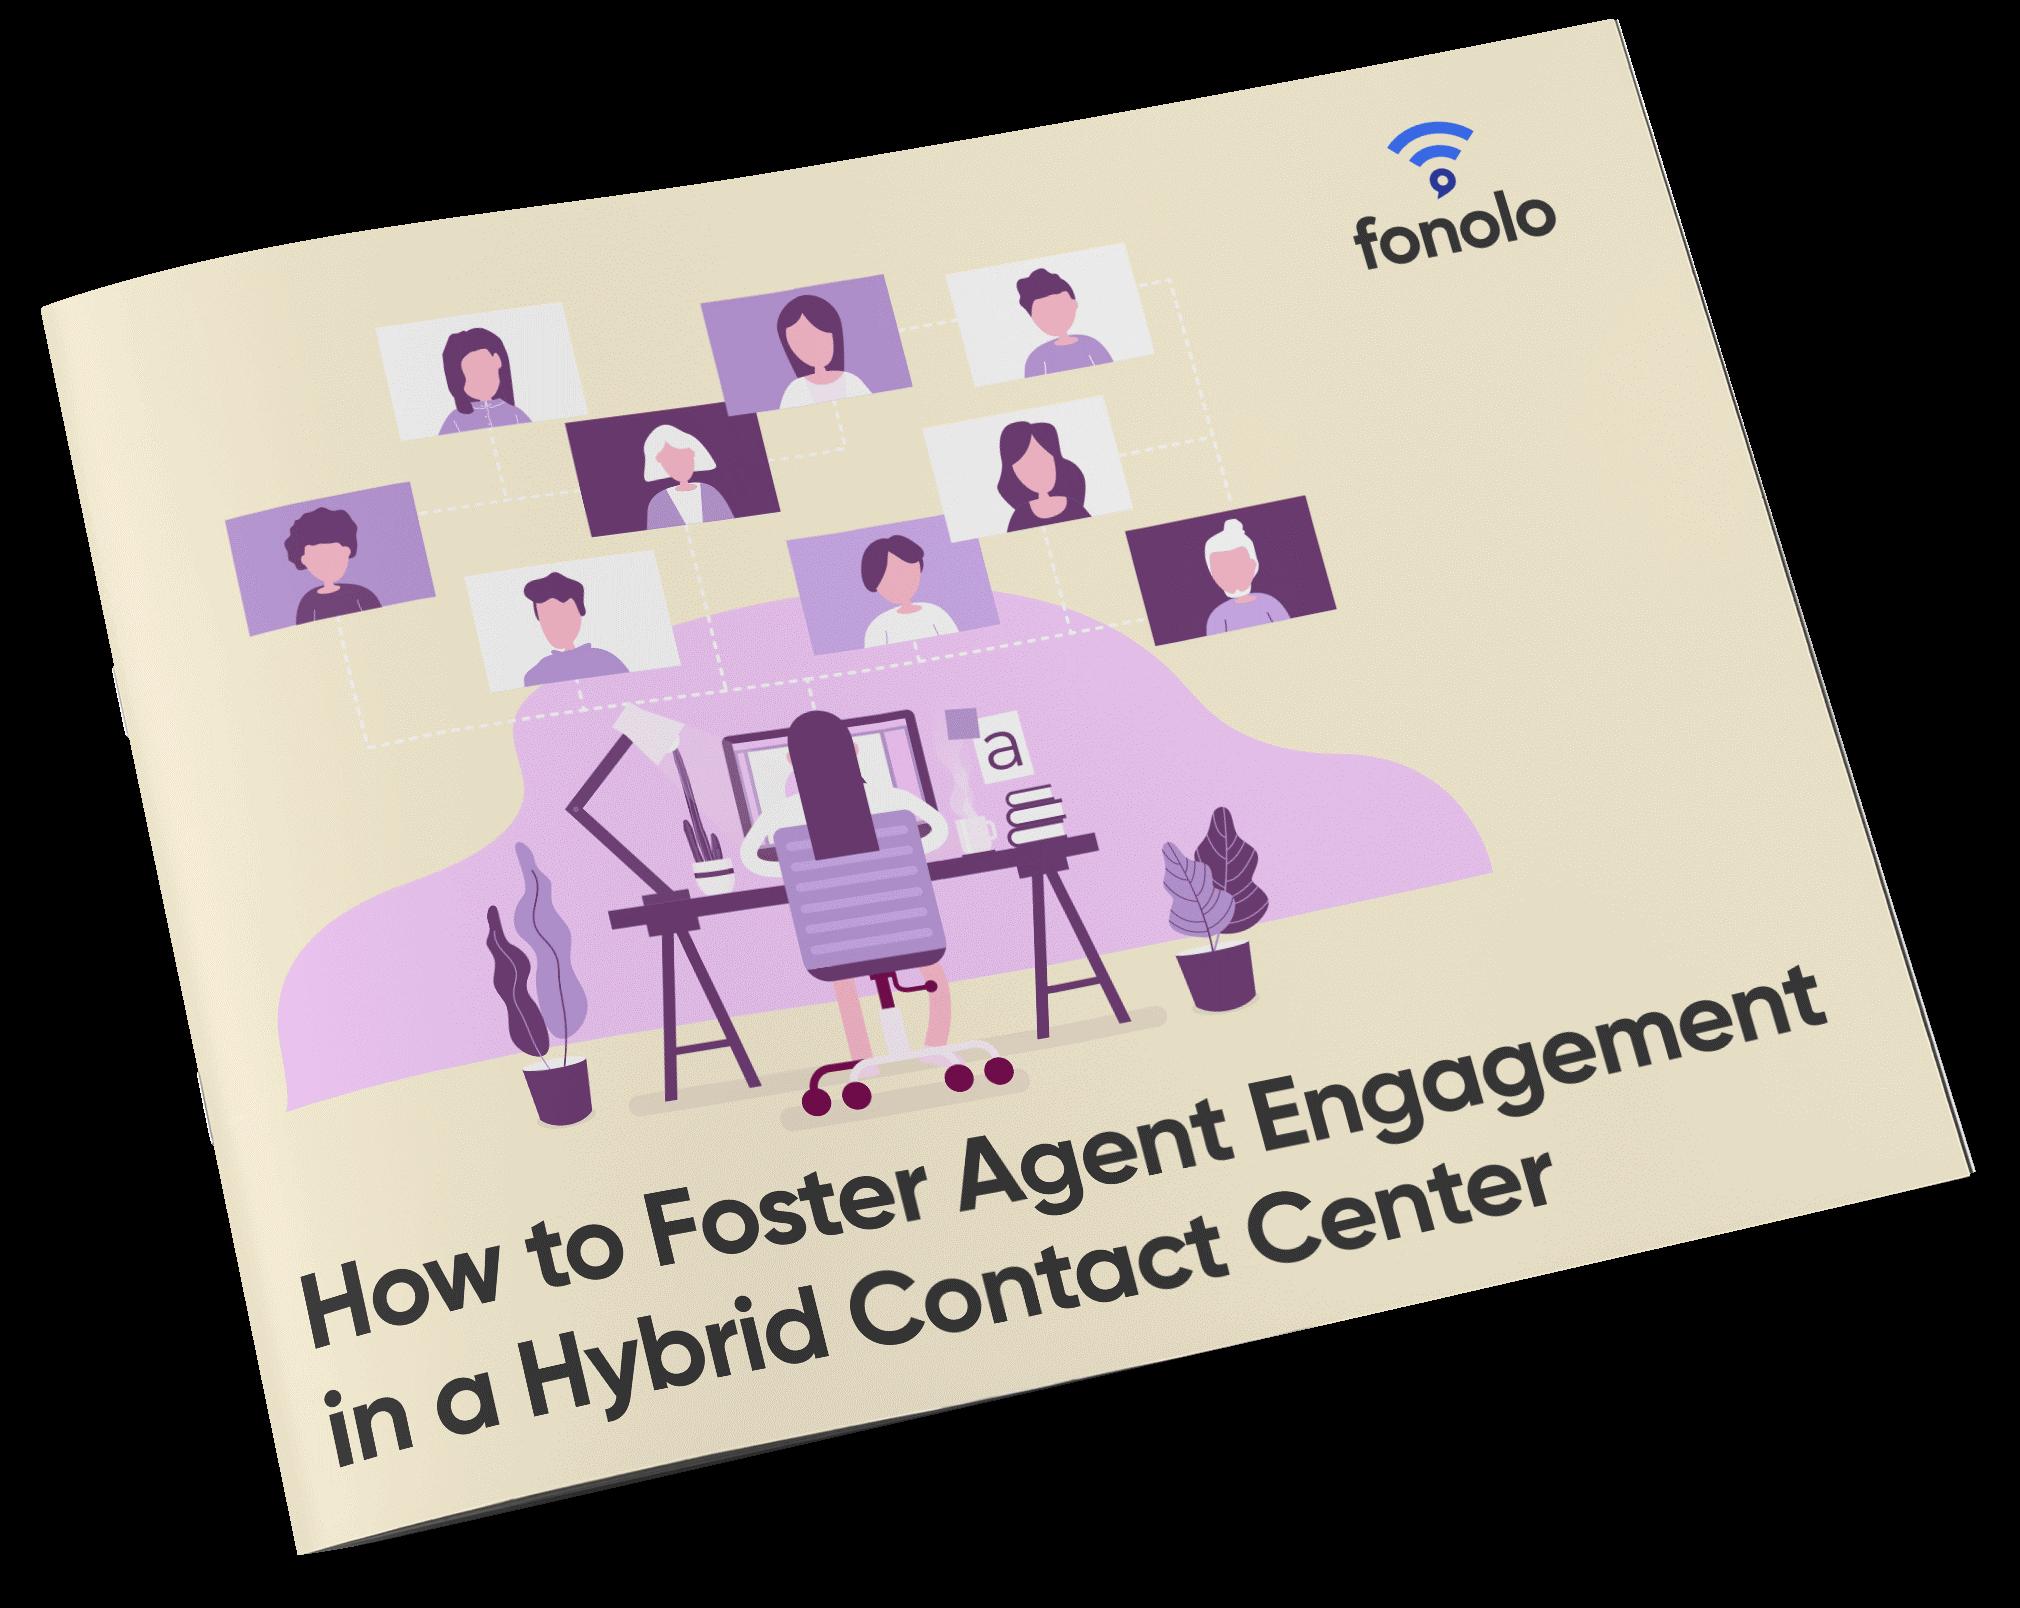 Agent_Engagement-1